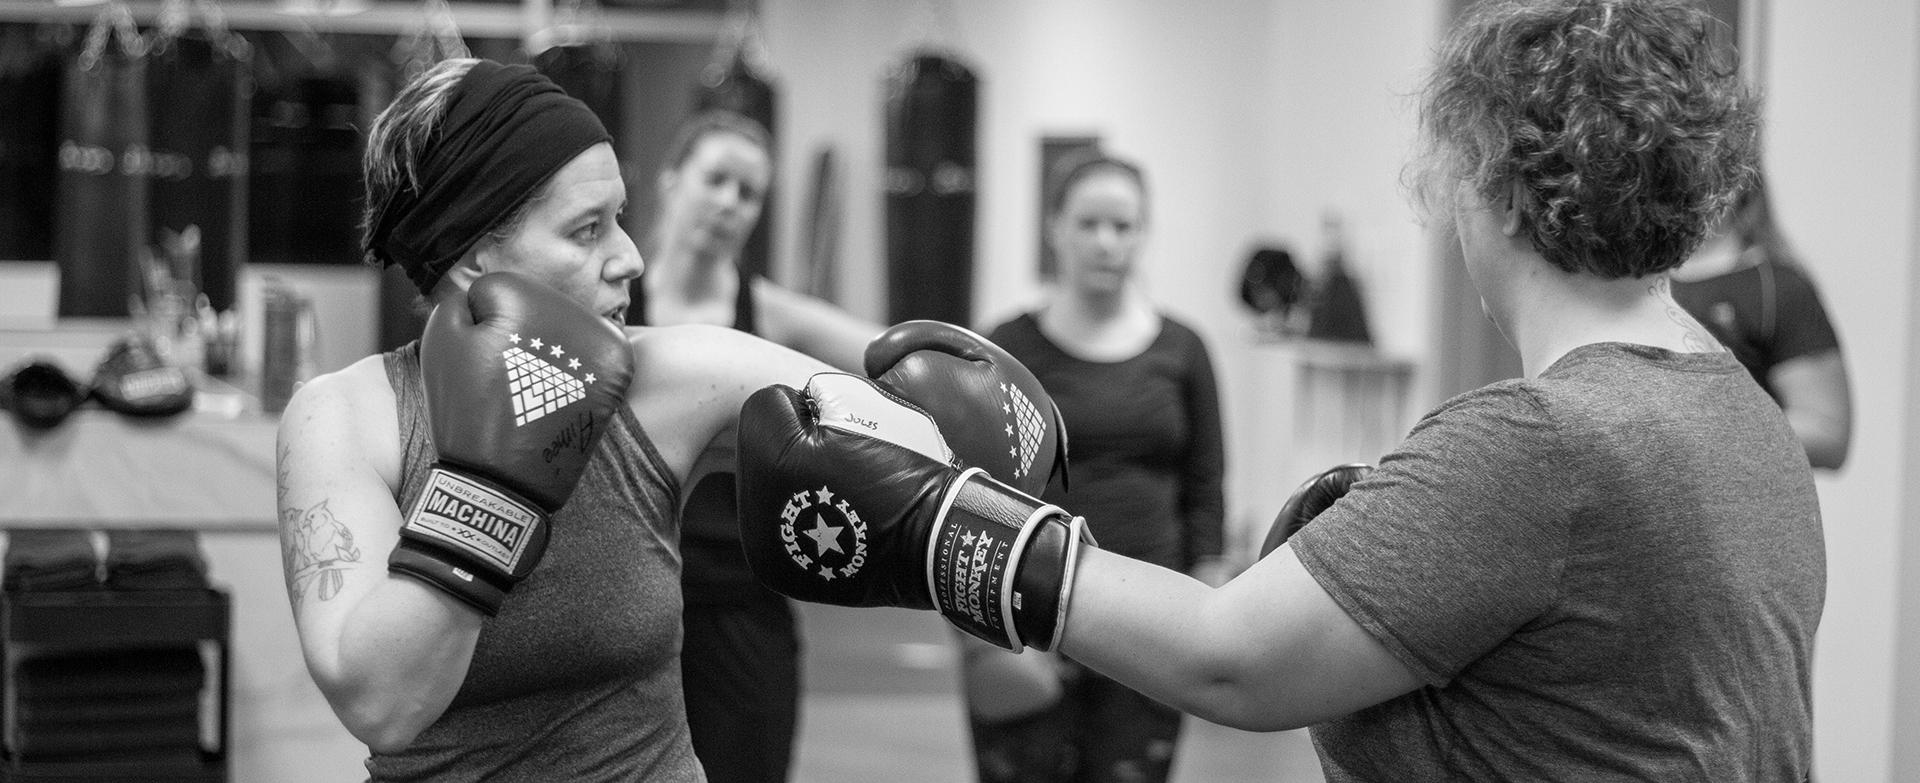 womensboxing4.jpg